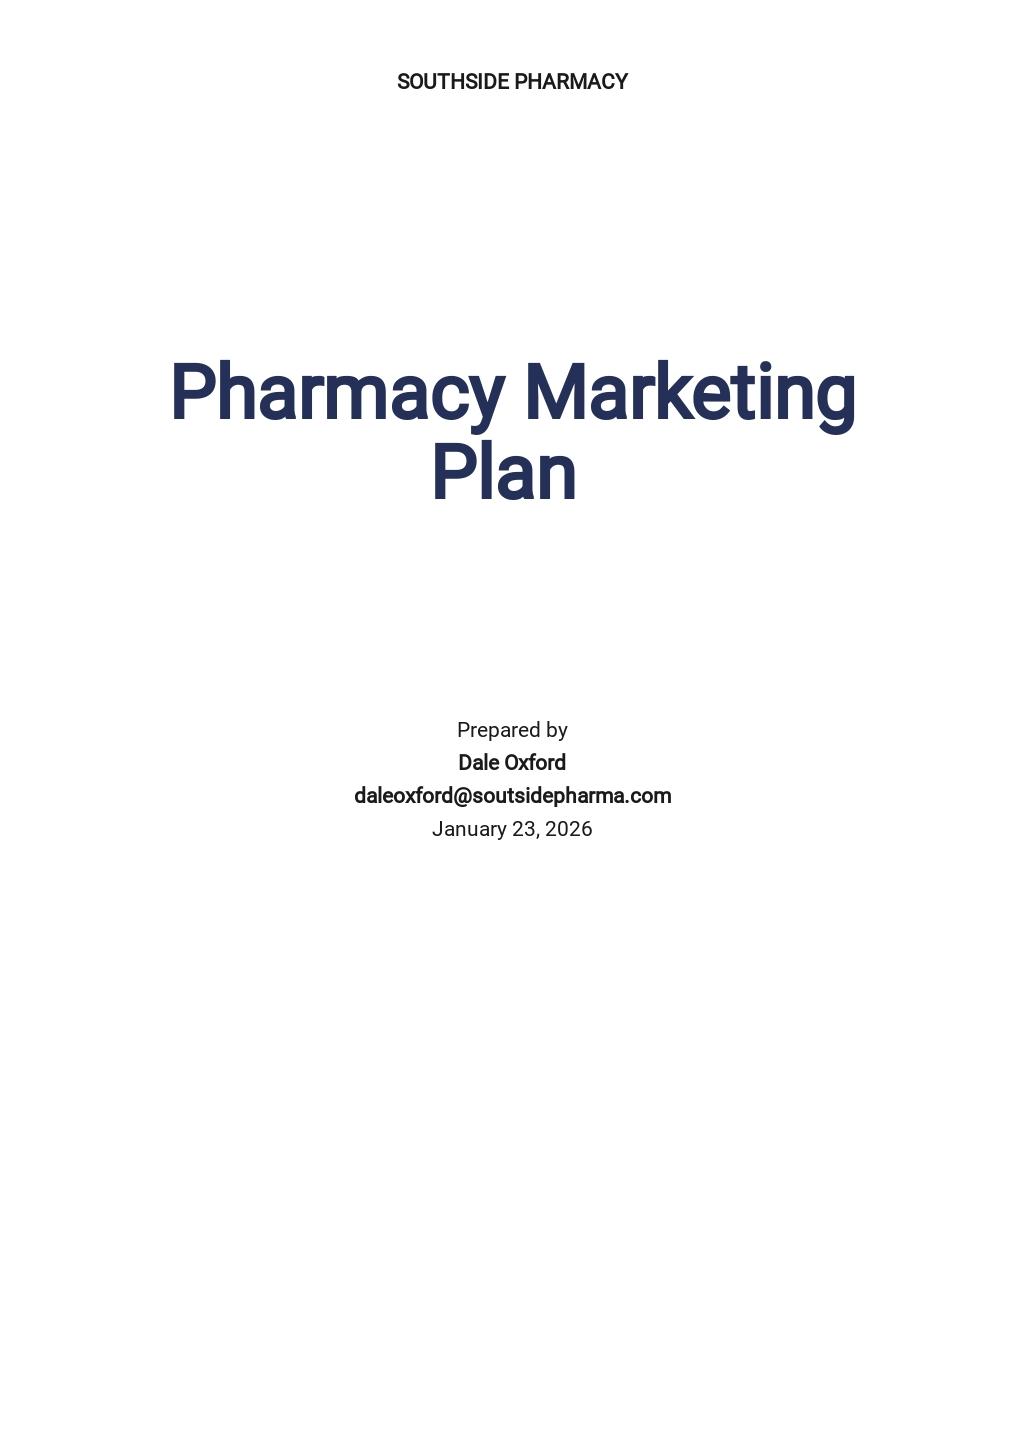 Pharmacy or Drug Store Marketing Plan Template